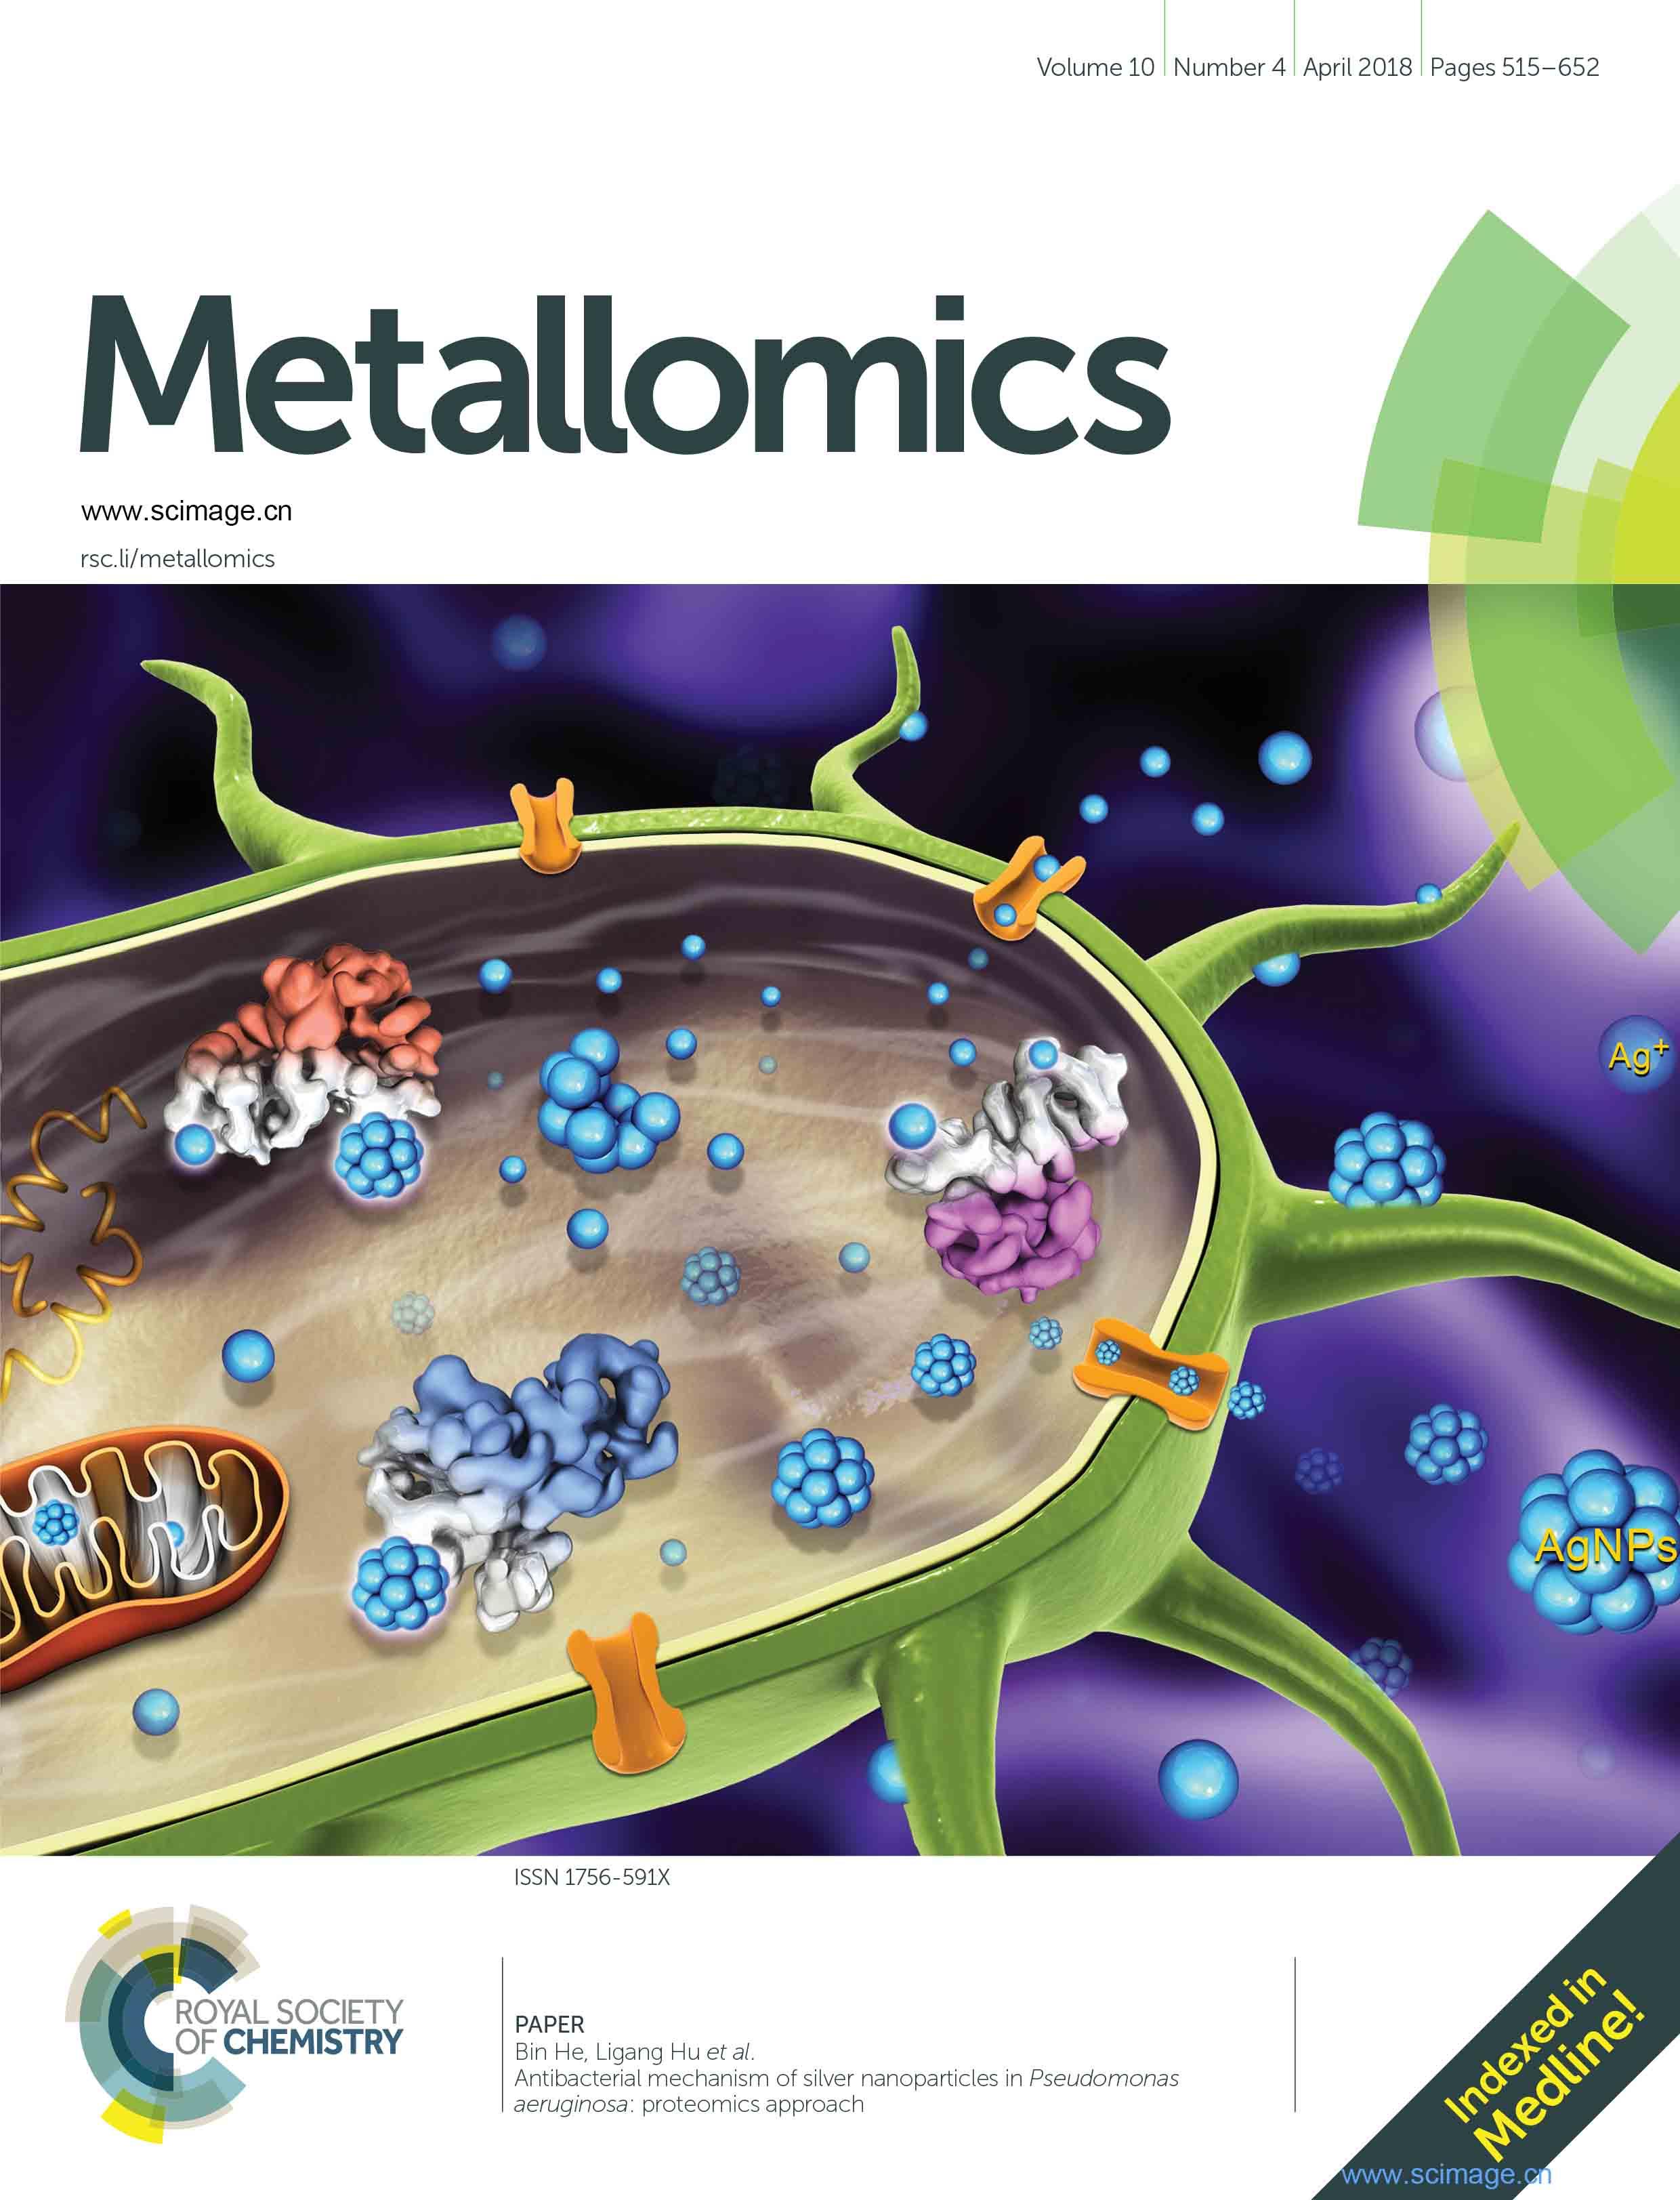 Antibacterial mechanism of silver nanoparticles in Pseudomonas aeruginosa: proteomics approach